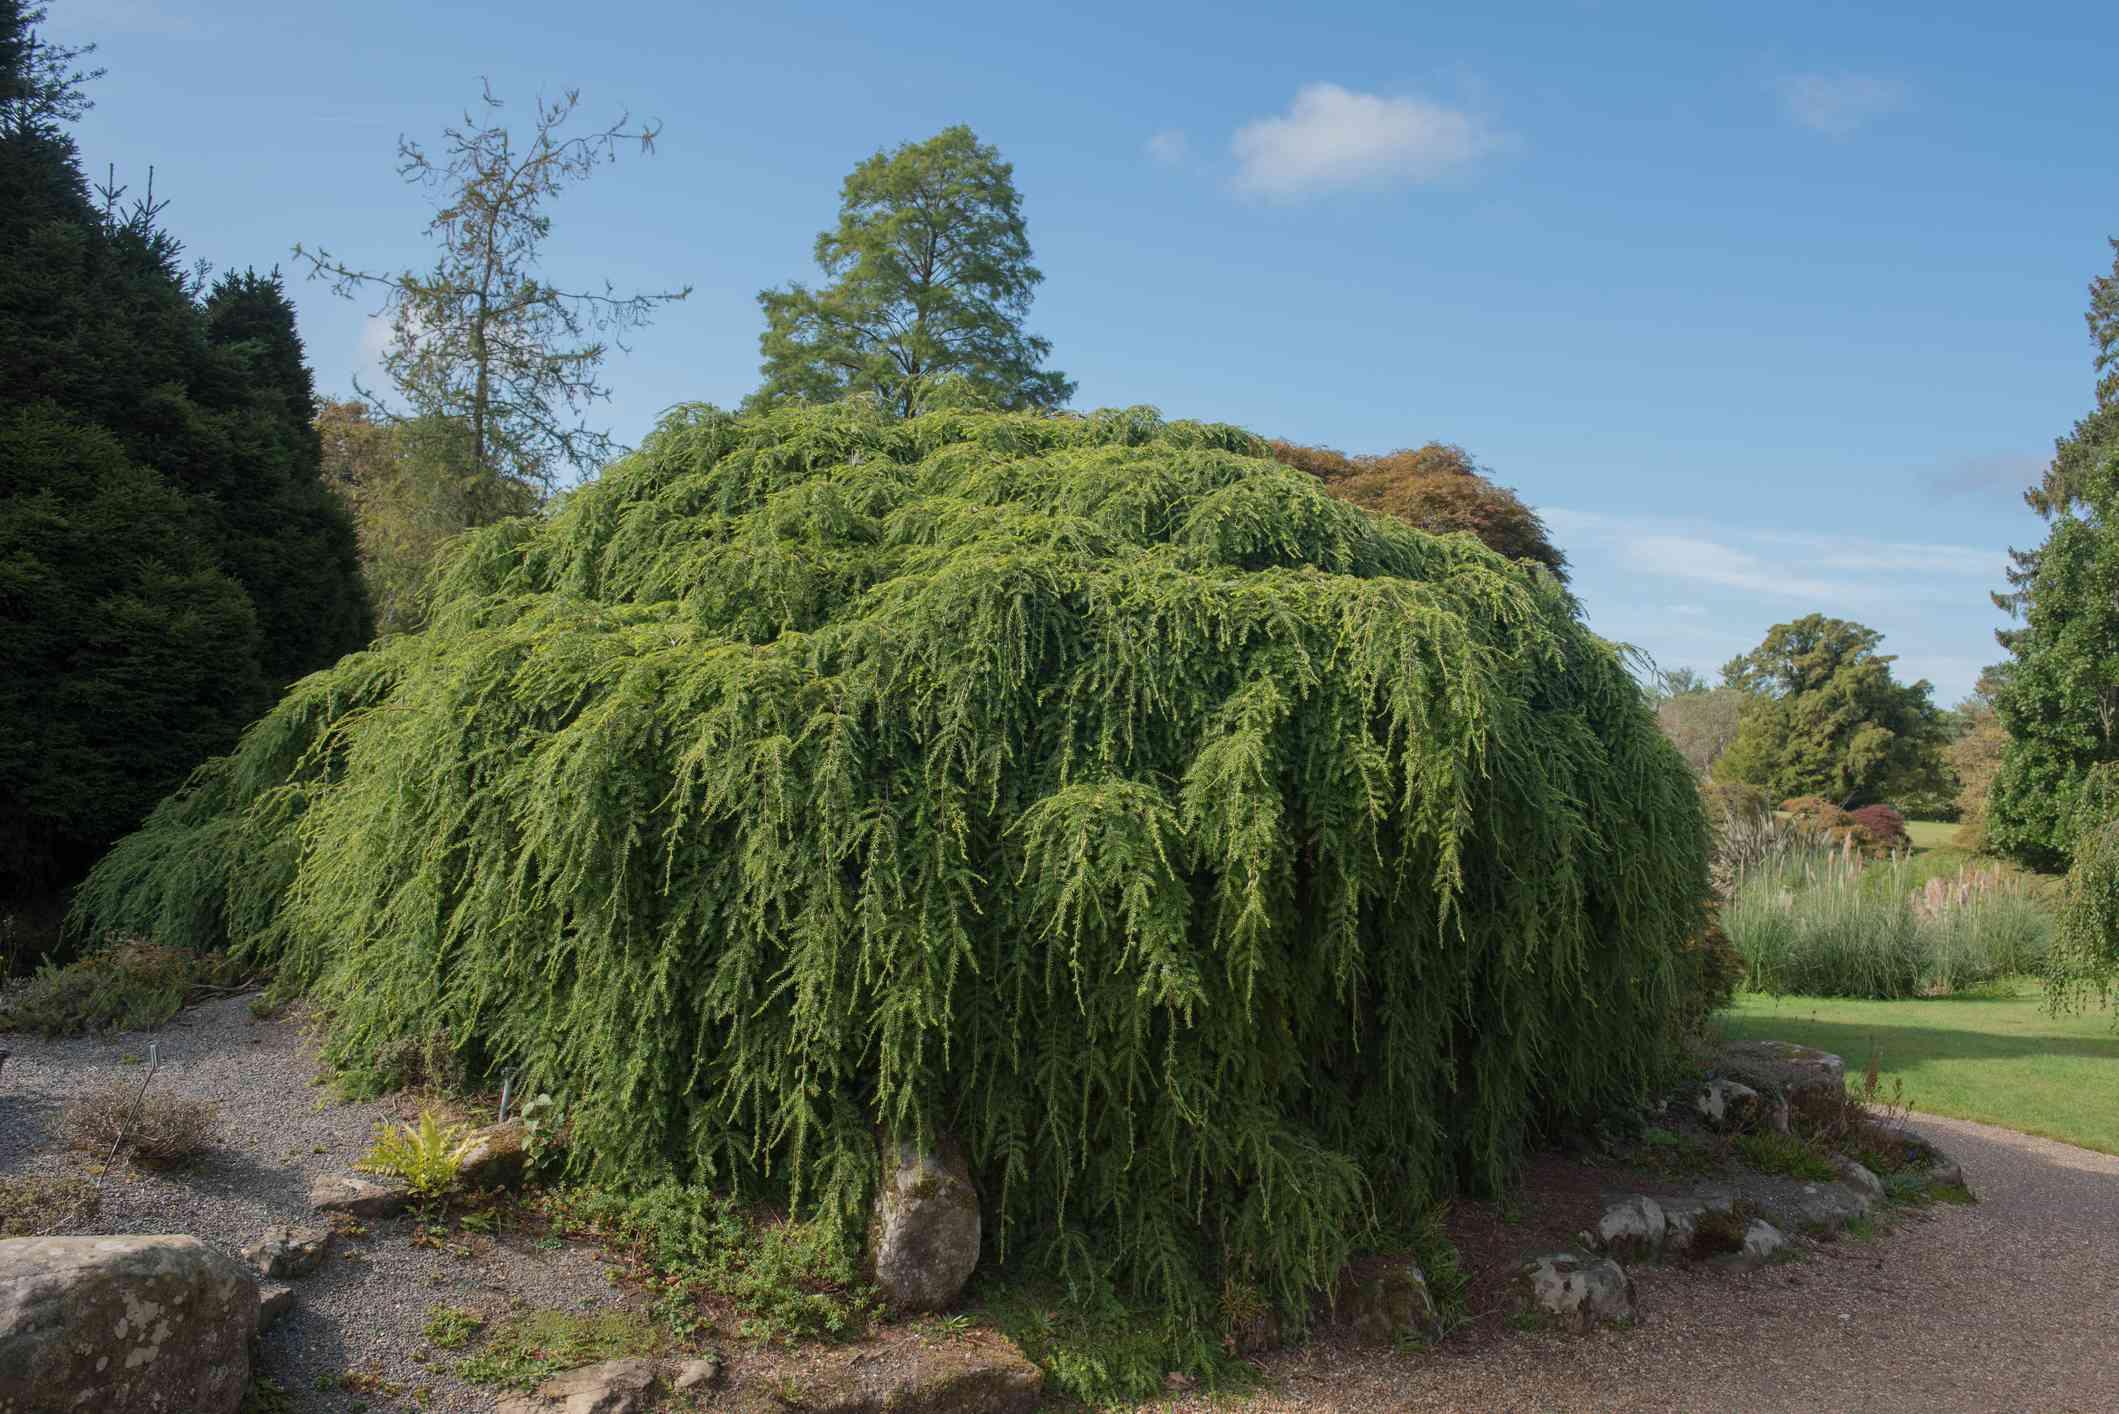 Green Foliage of the Evergreen Coniferous Weeping Eastern Hemlock Shrub (Tsuga canadensis 'Pendula') in a Park